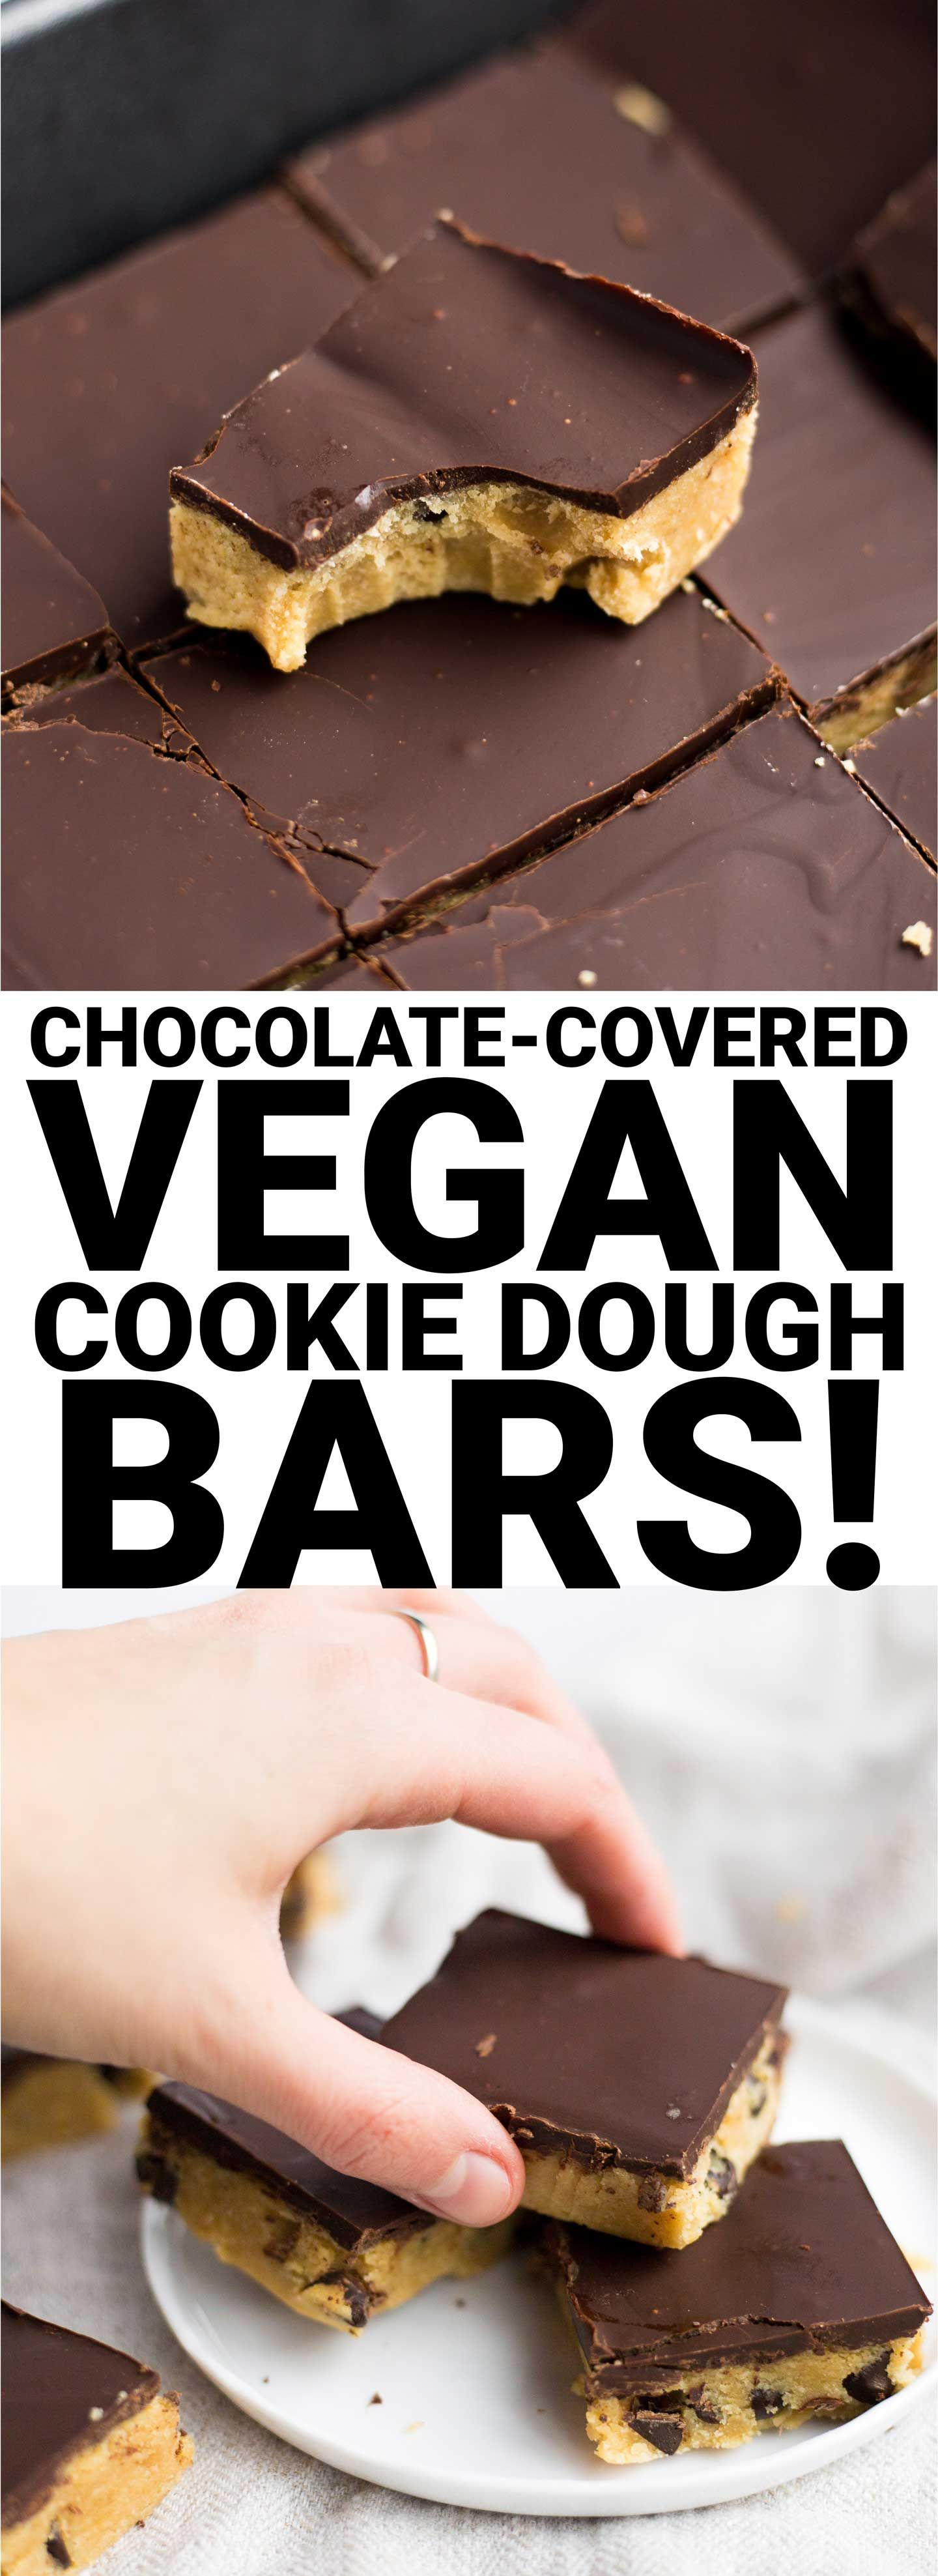 Chocolate-Covered Vegan Cookie Dough Bars - Fooduzzi